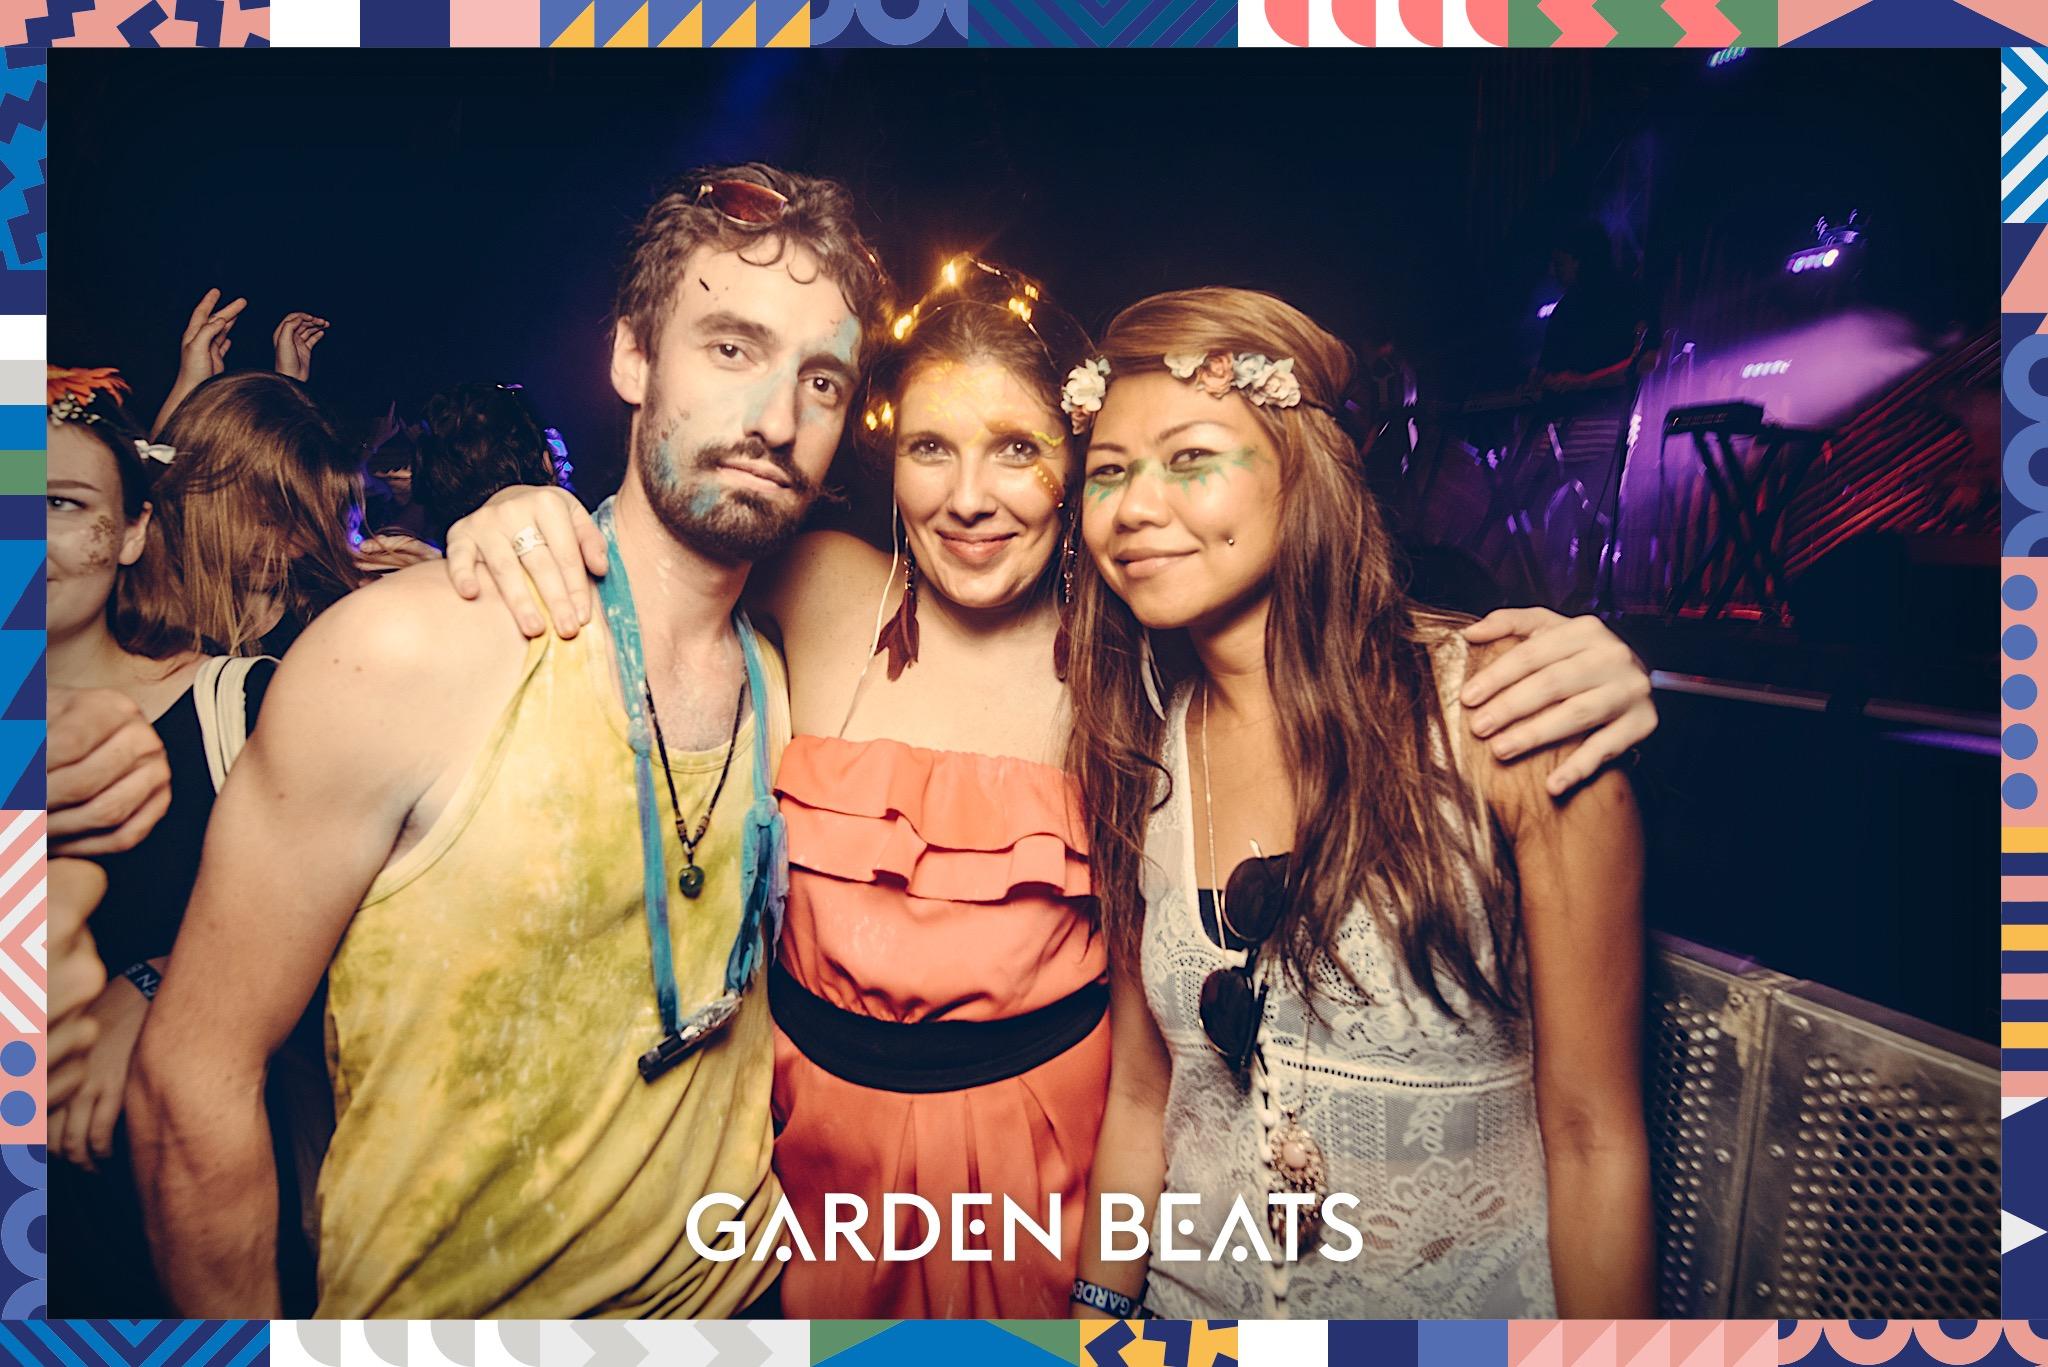 18032017_GardenBeats_Colossal752_WatermarkedGB.jpg